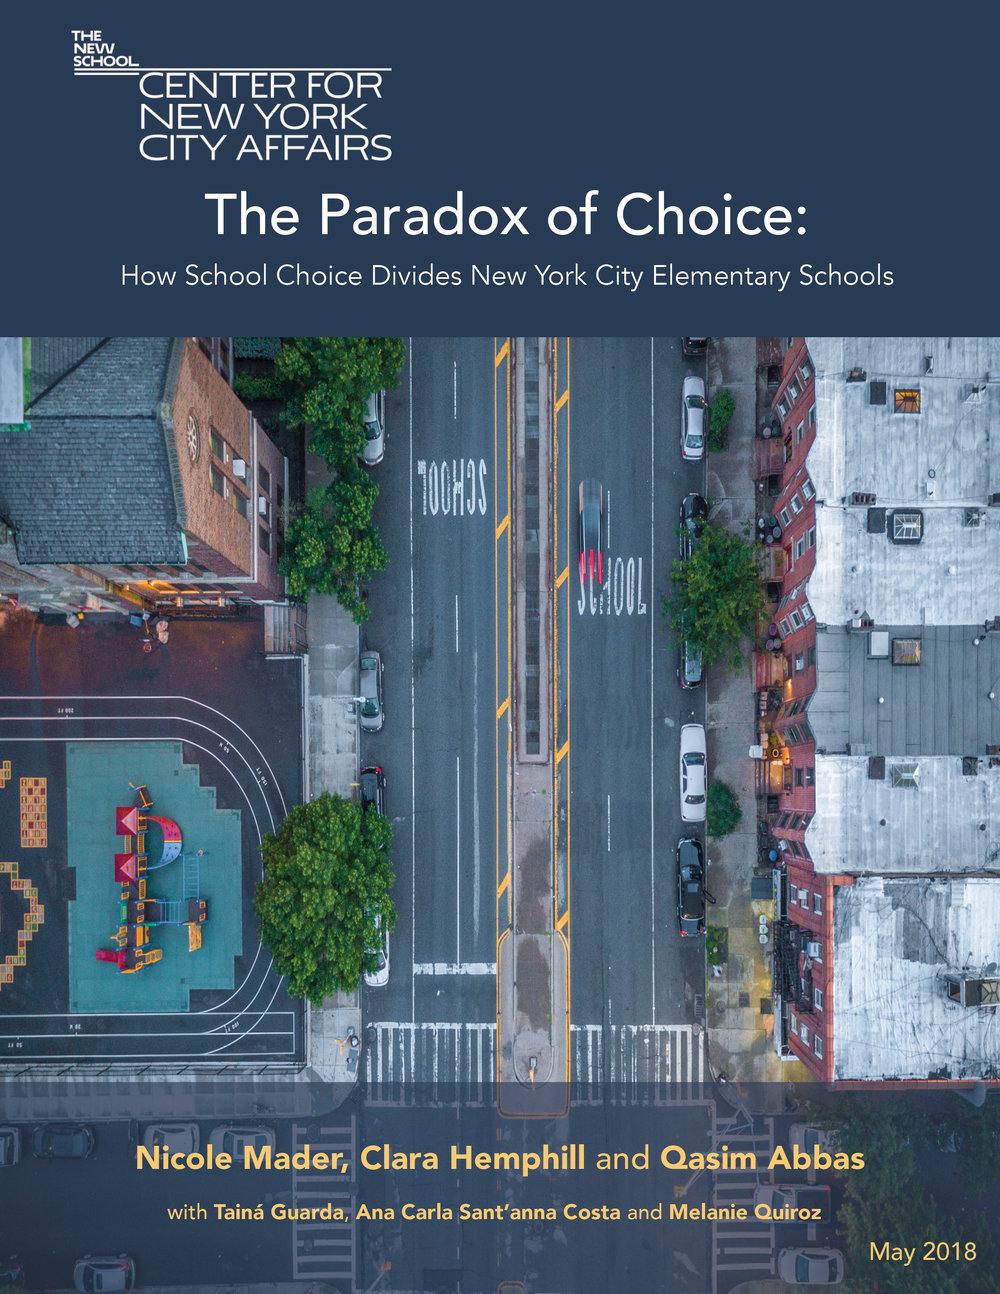 The Paradox of Choice.jpg